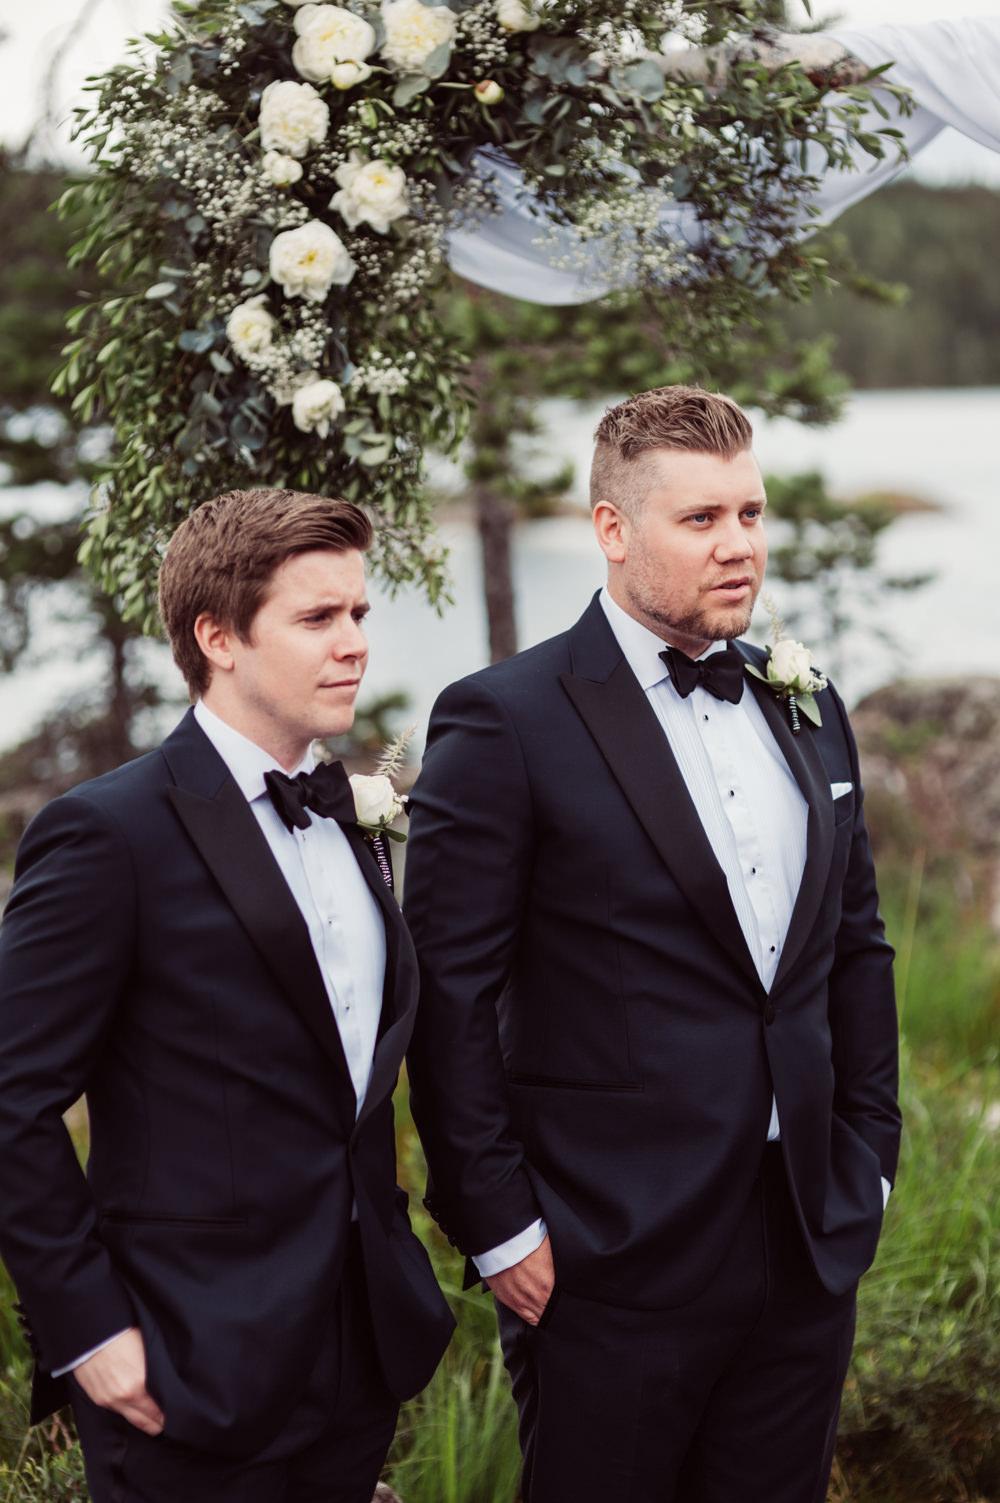 Groom Suit Tux Bow Tie Groomsmen Norway Wedding Maximilian Photography